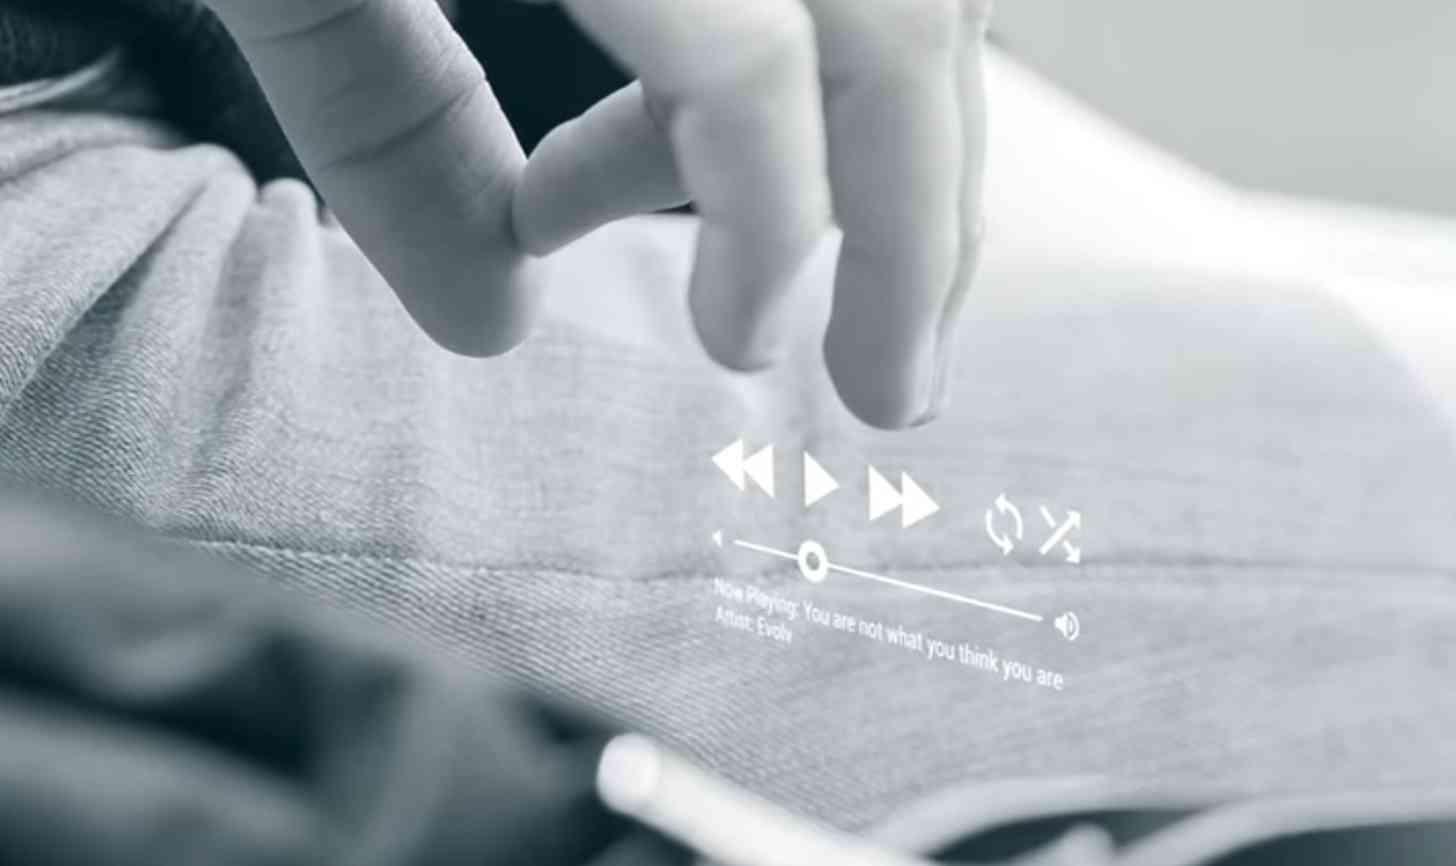 Project Soli audio hesture control